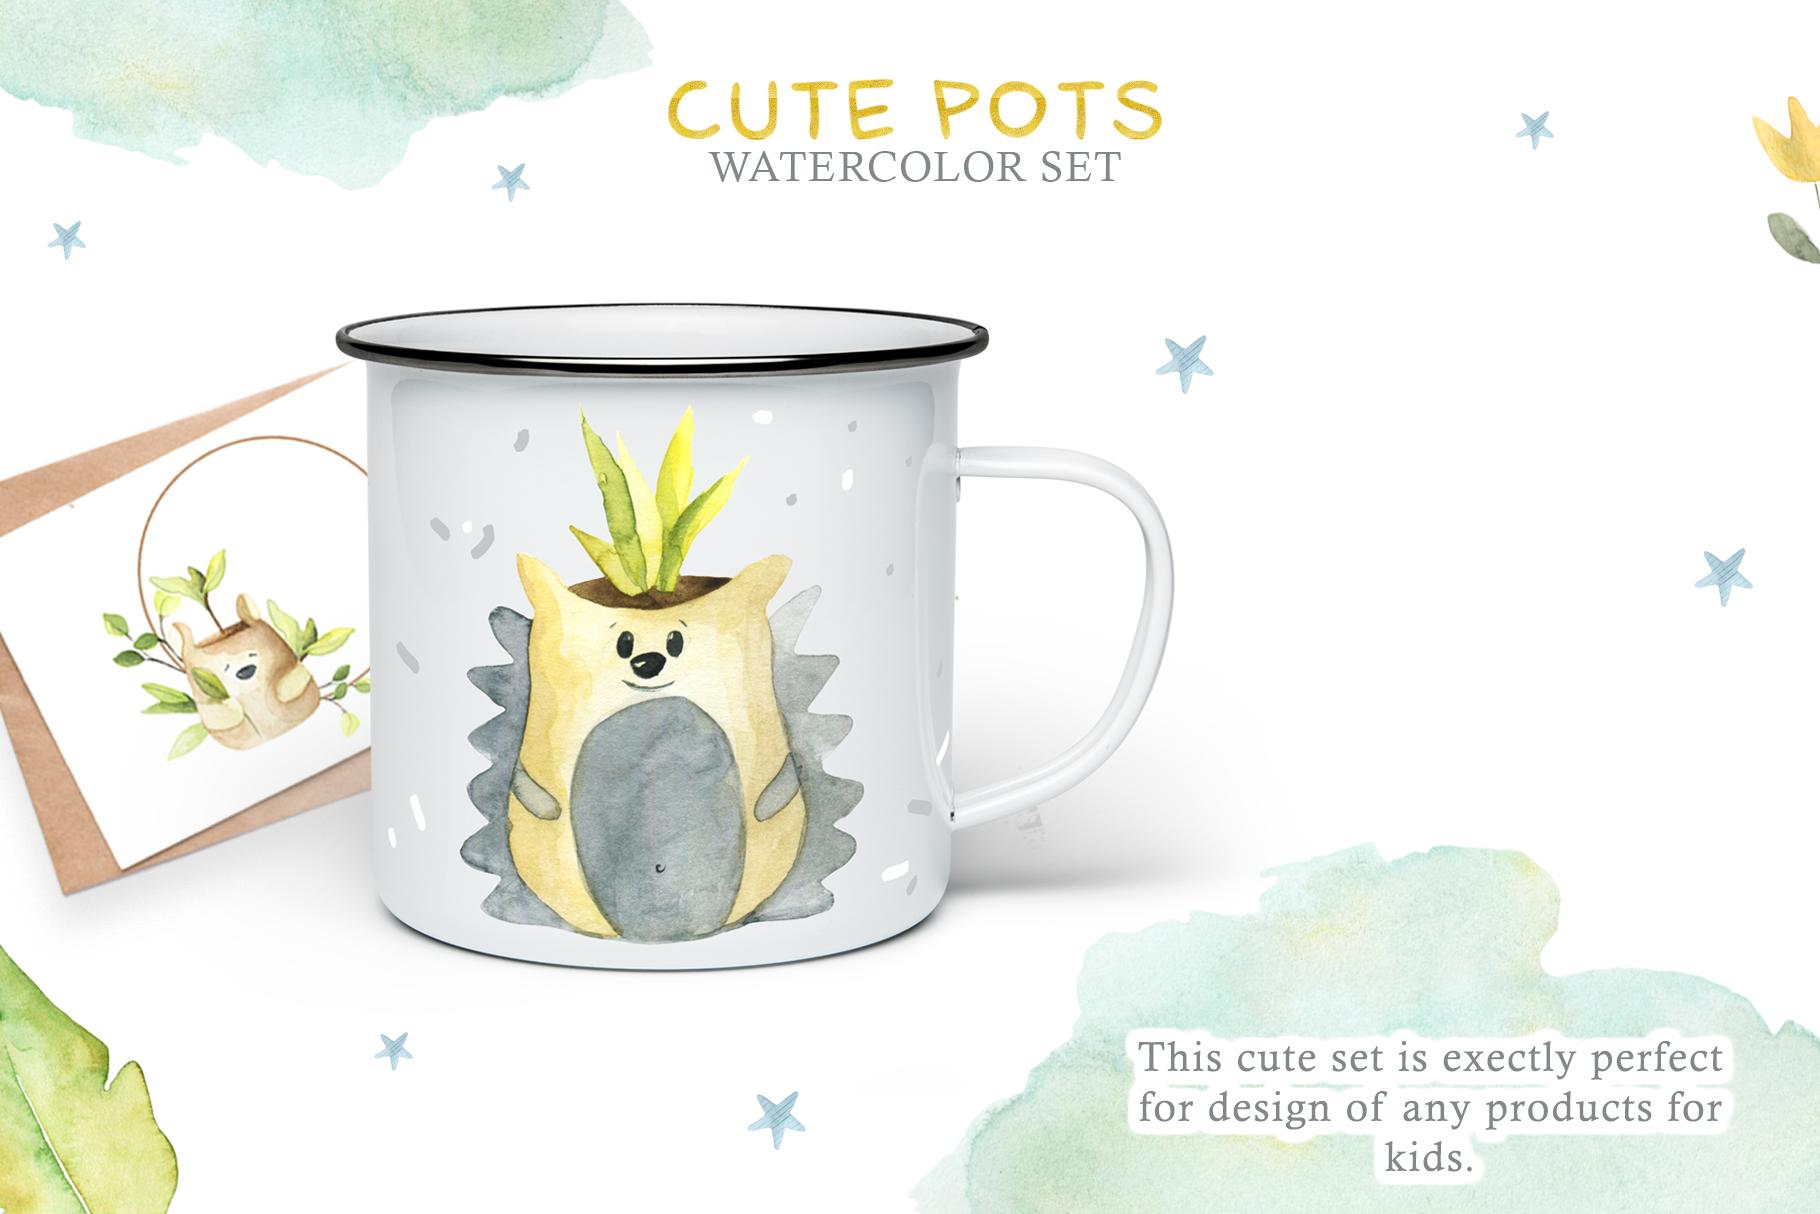 Watercolor Set Cute Pots example image 3